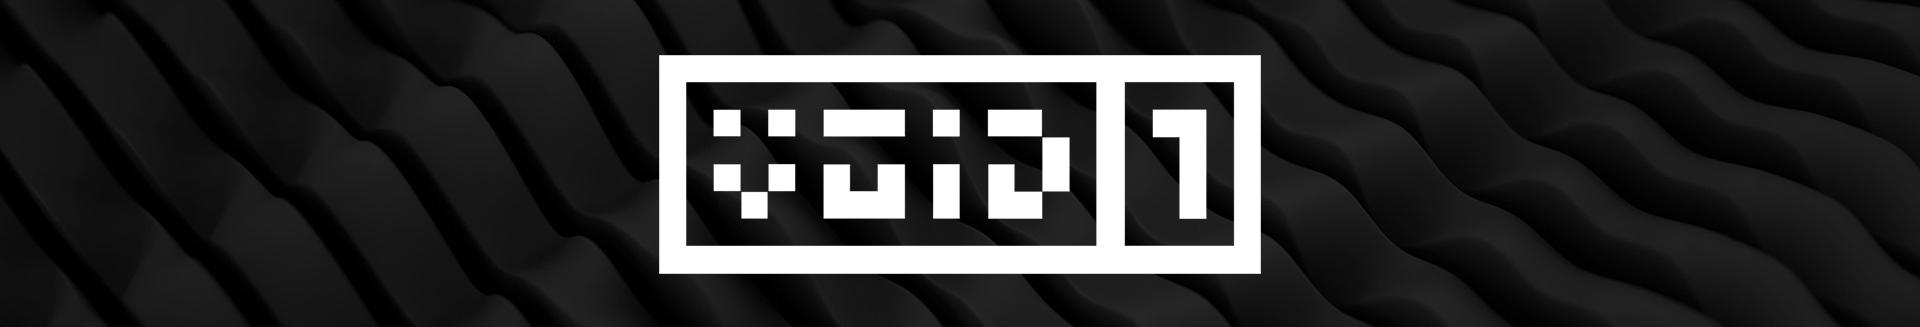 Basic Platformer Movement Script